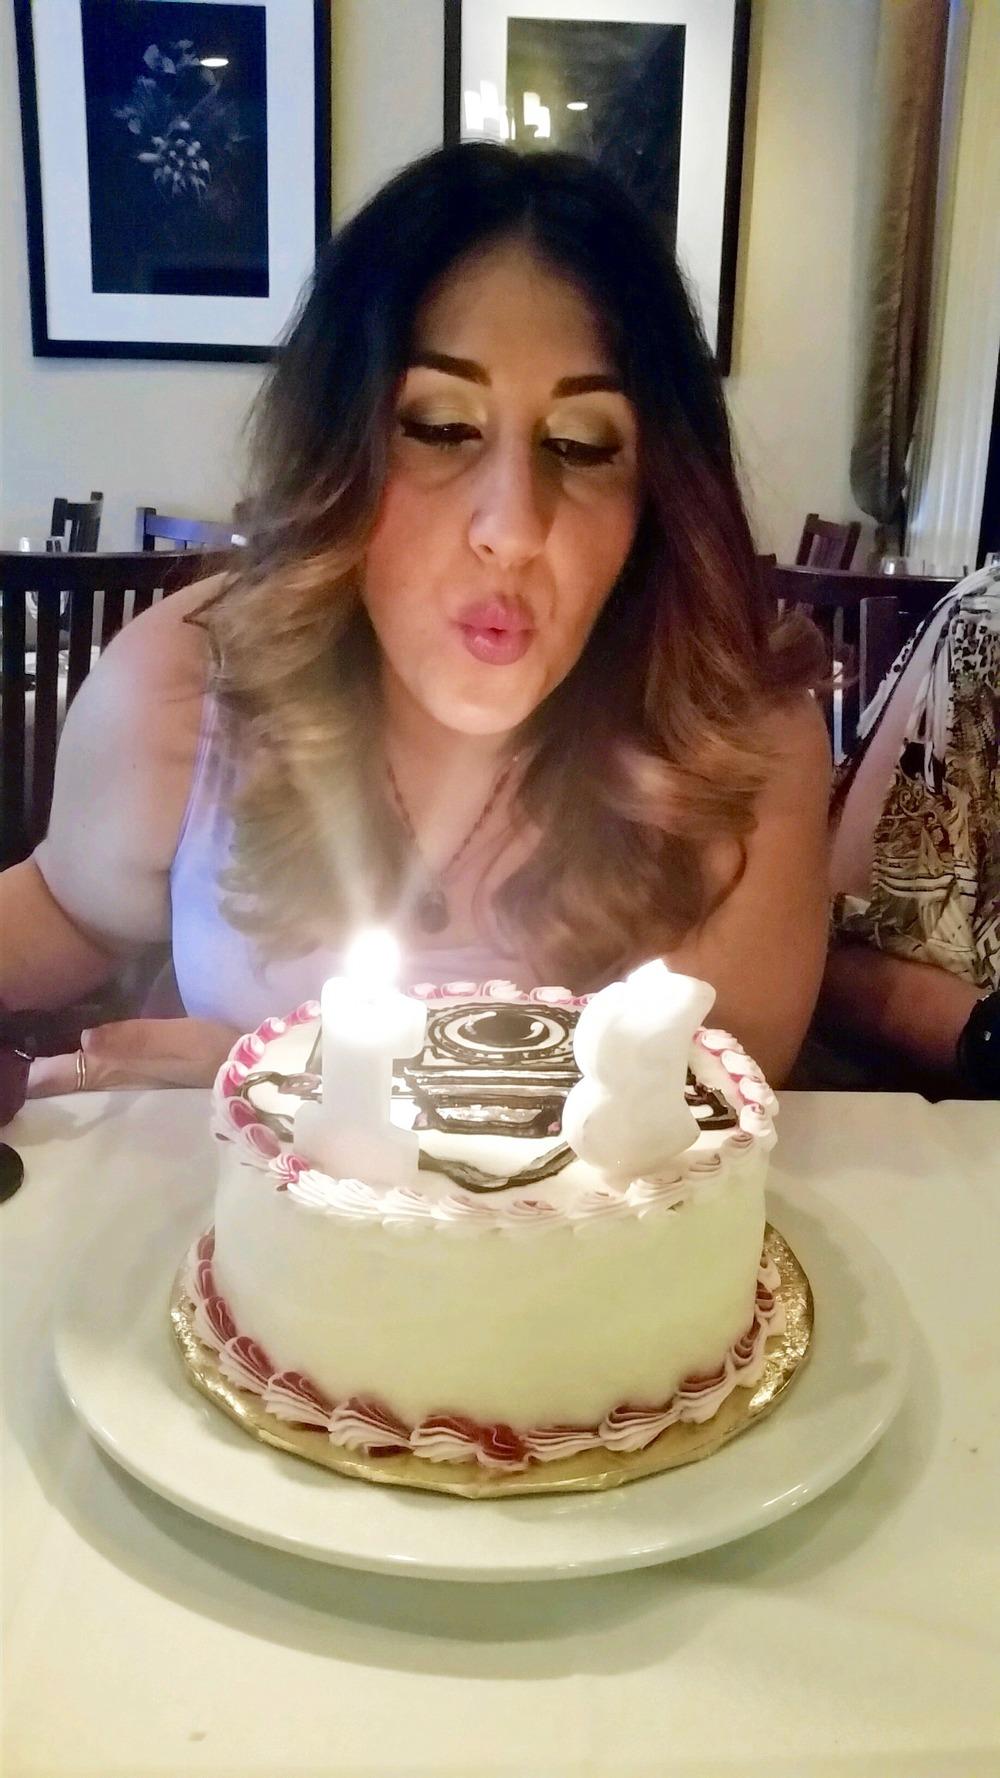 My 31st Birthday - 11 of 13.jpg